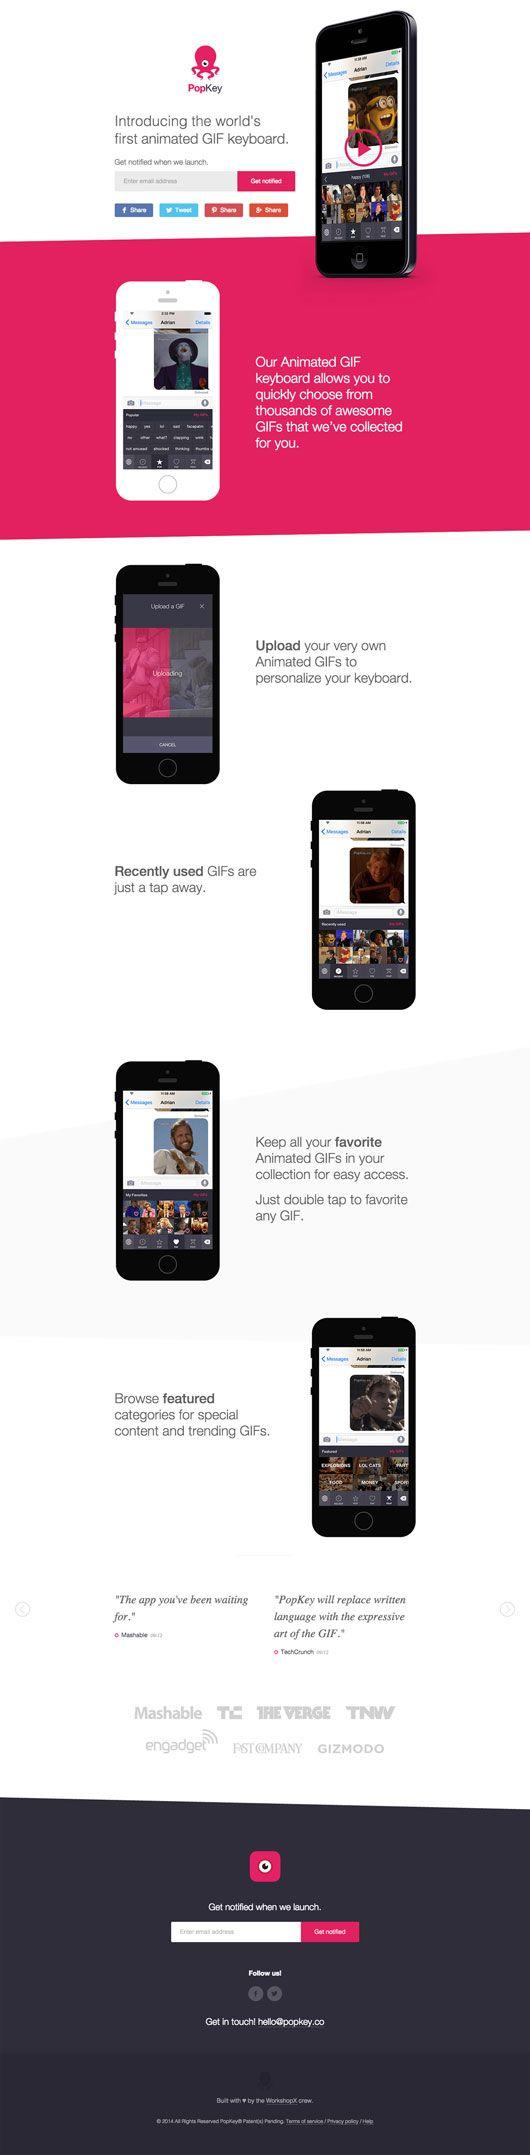 Mobile App Landing Page: PopKey #flat #landingpage